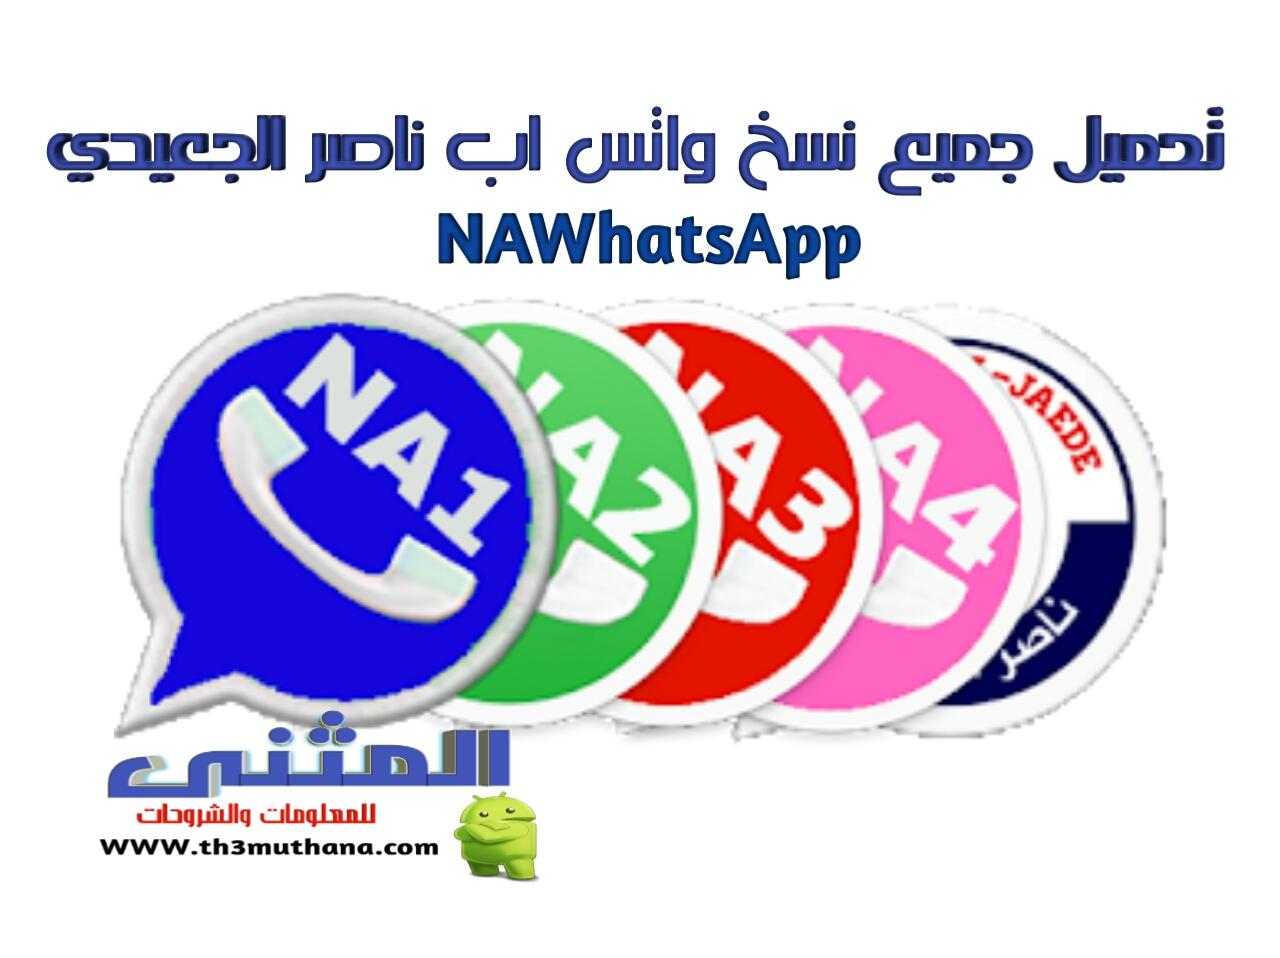 تحميل واتساب ناصر الجعيدي NAWhatsApp اخر اصدار